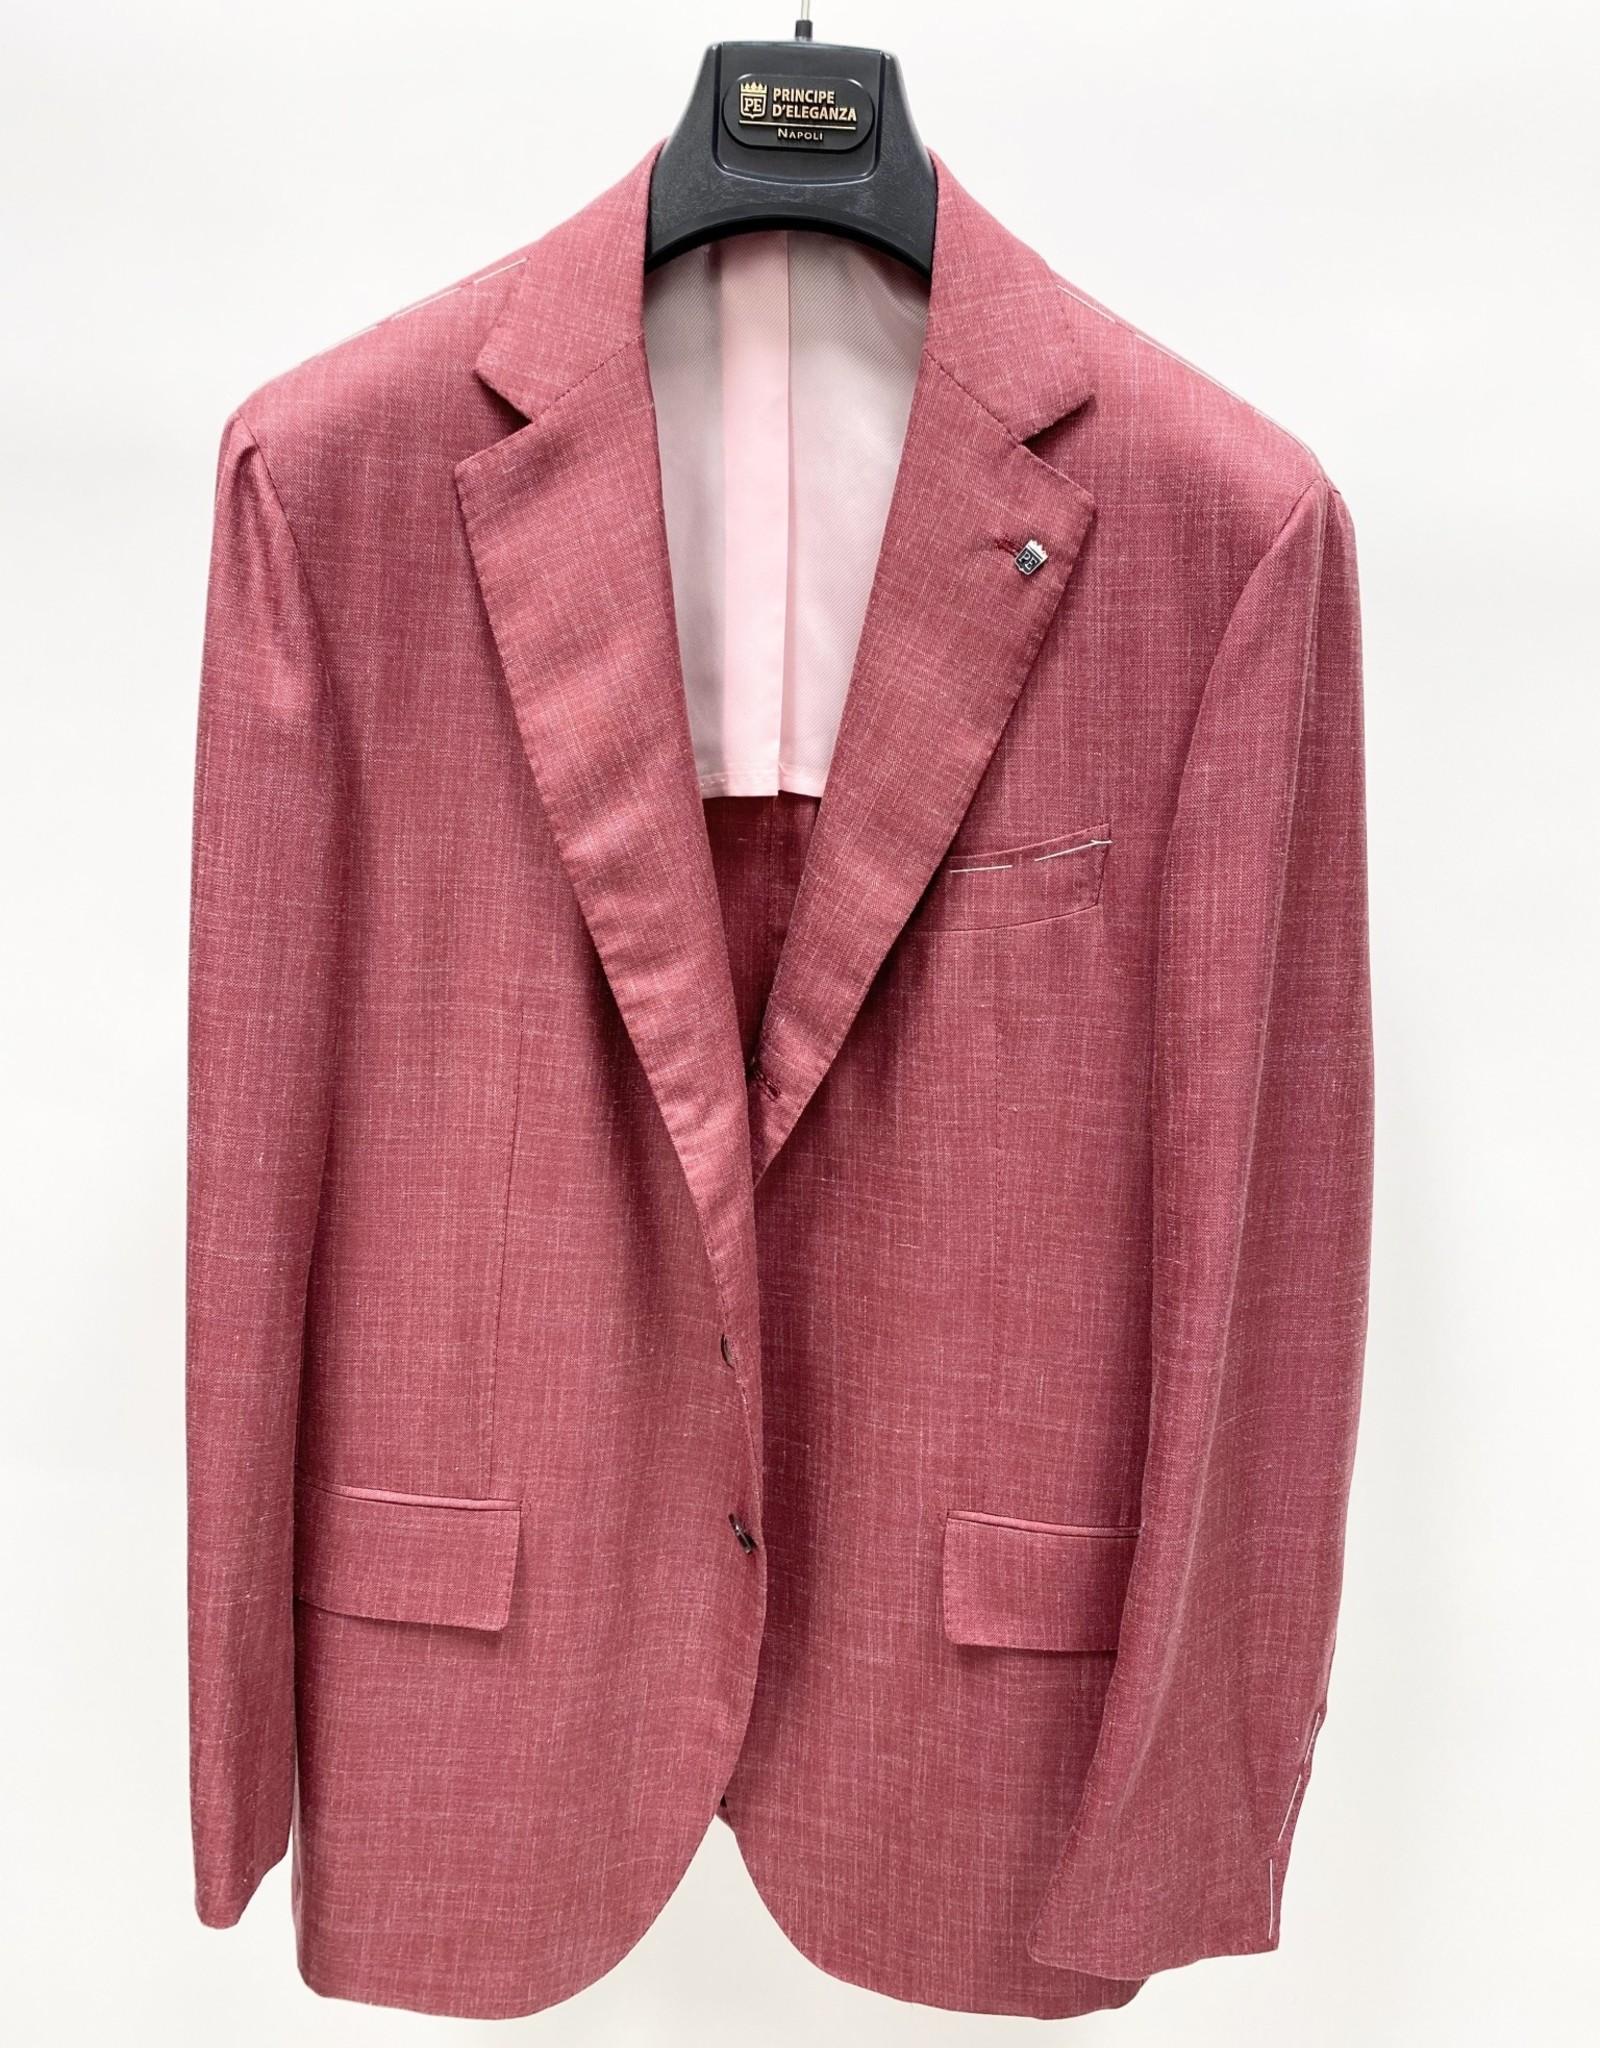 Principe d' Eleganza Neapolitan Sport Coat 54EU/44US